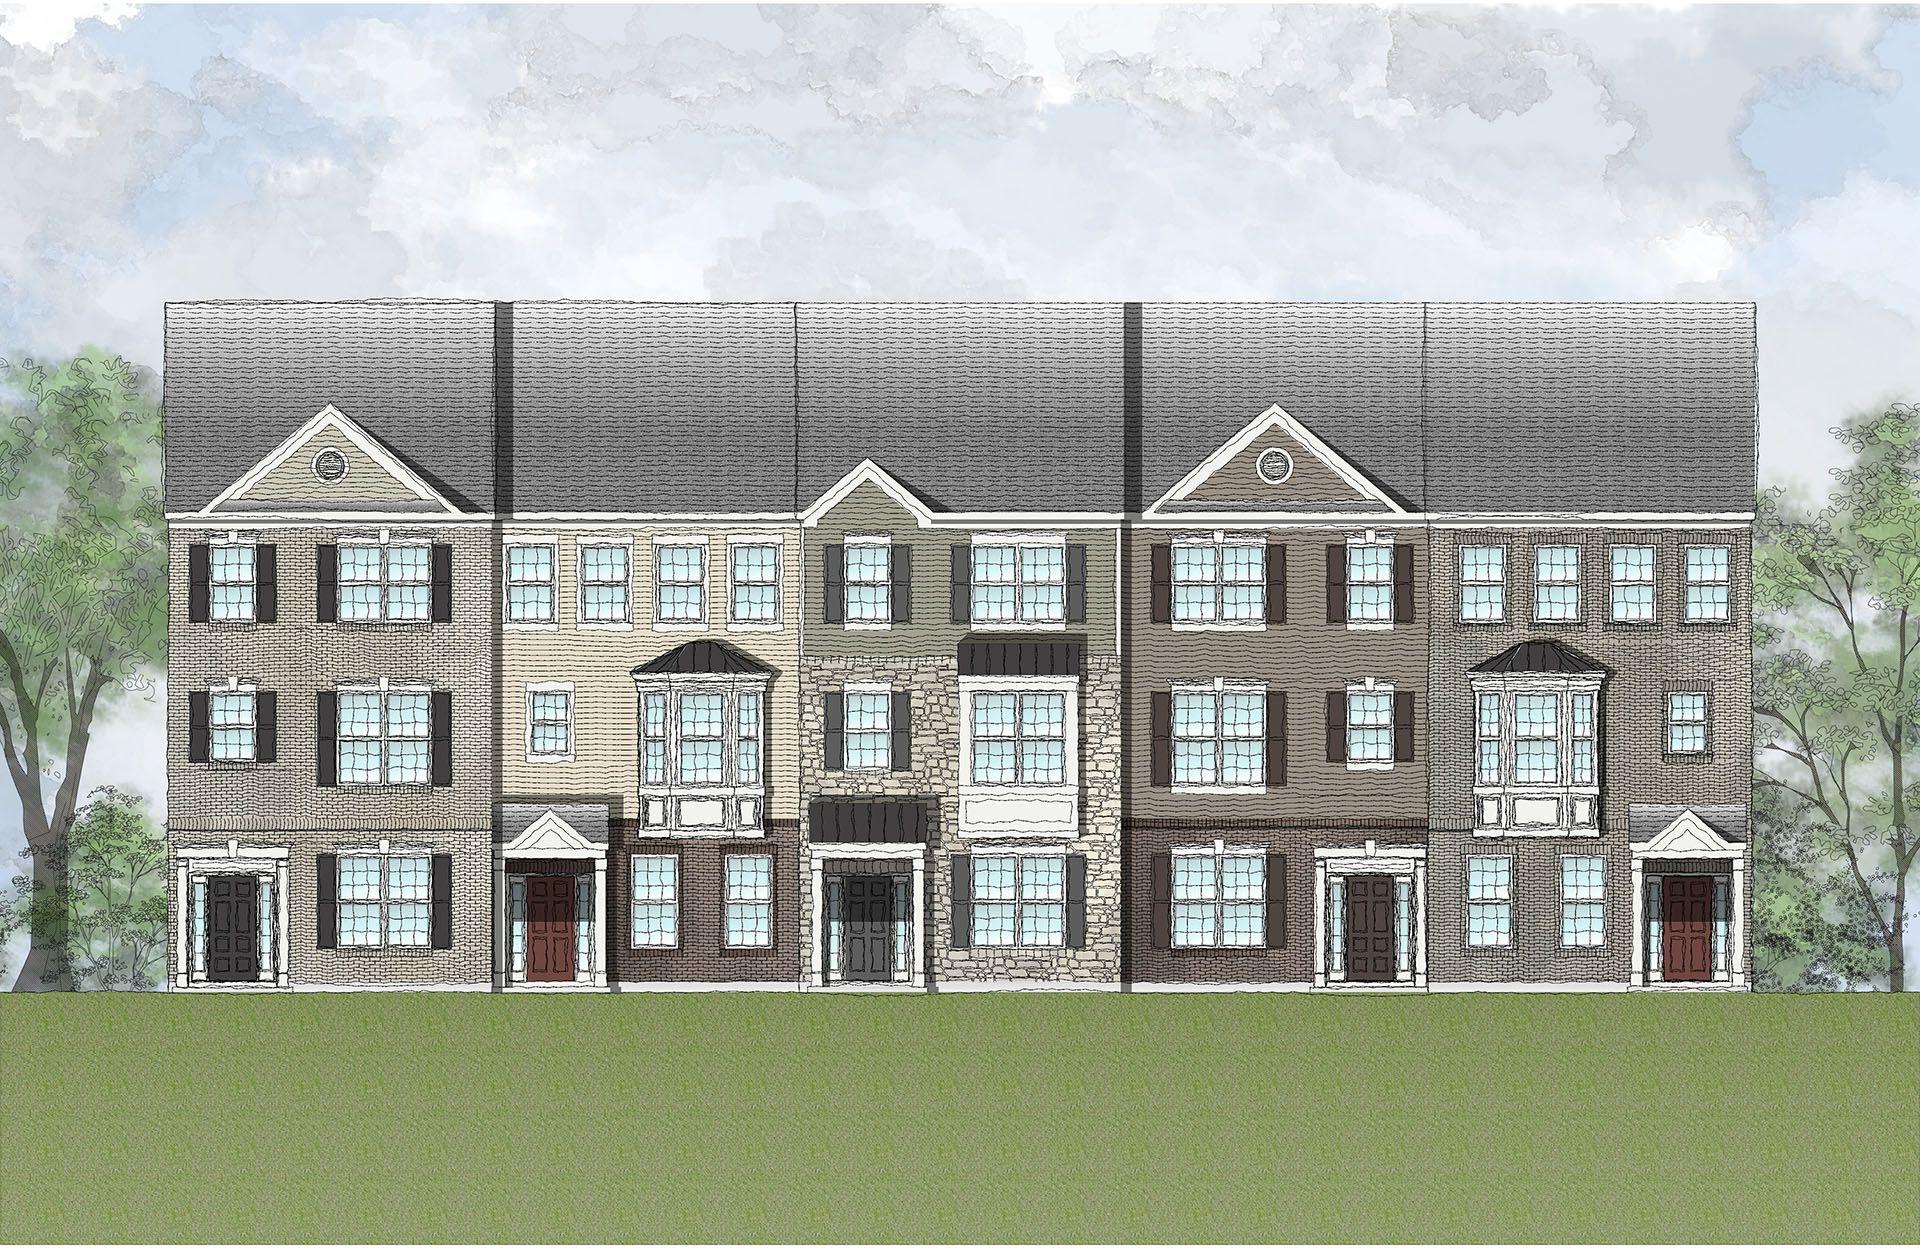 Real Estate at New Post - Townhomes, Fredericksburg in Spotsylvania County, VA 22408